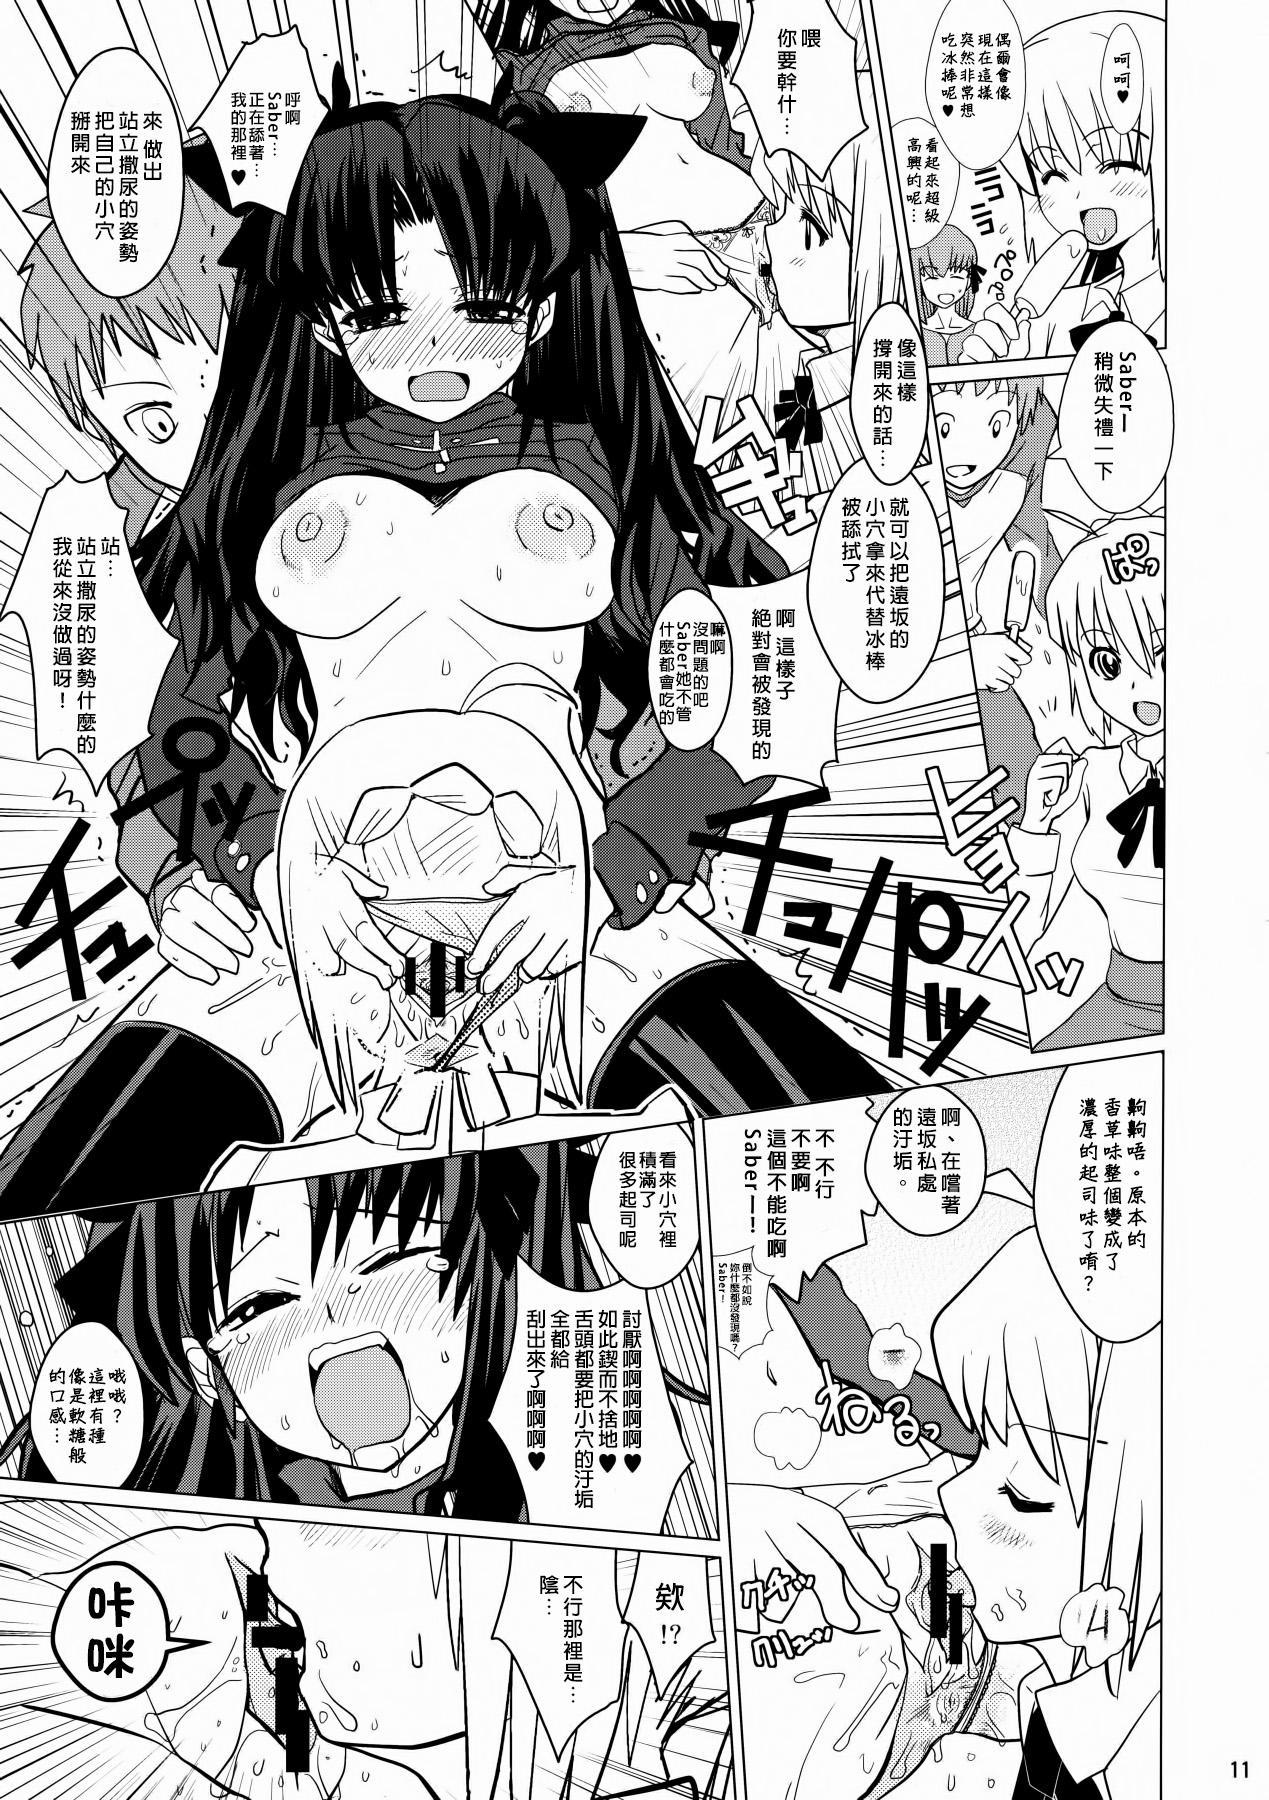 Smells like Rin Tohsaka 10